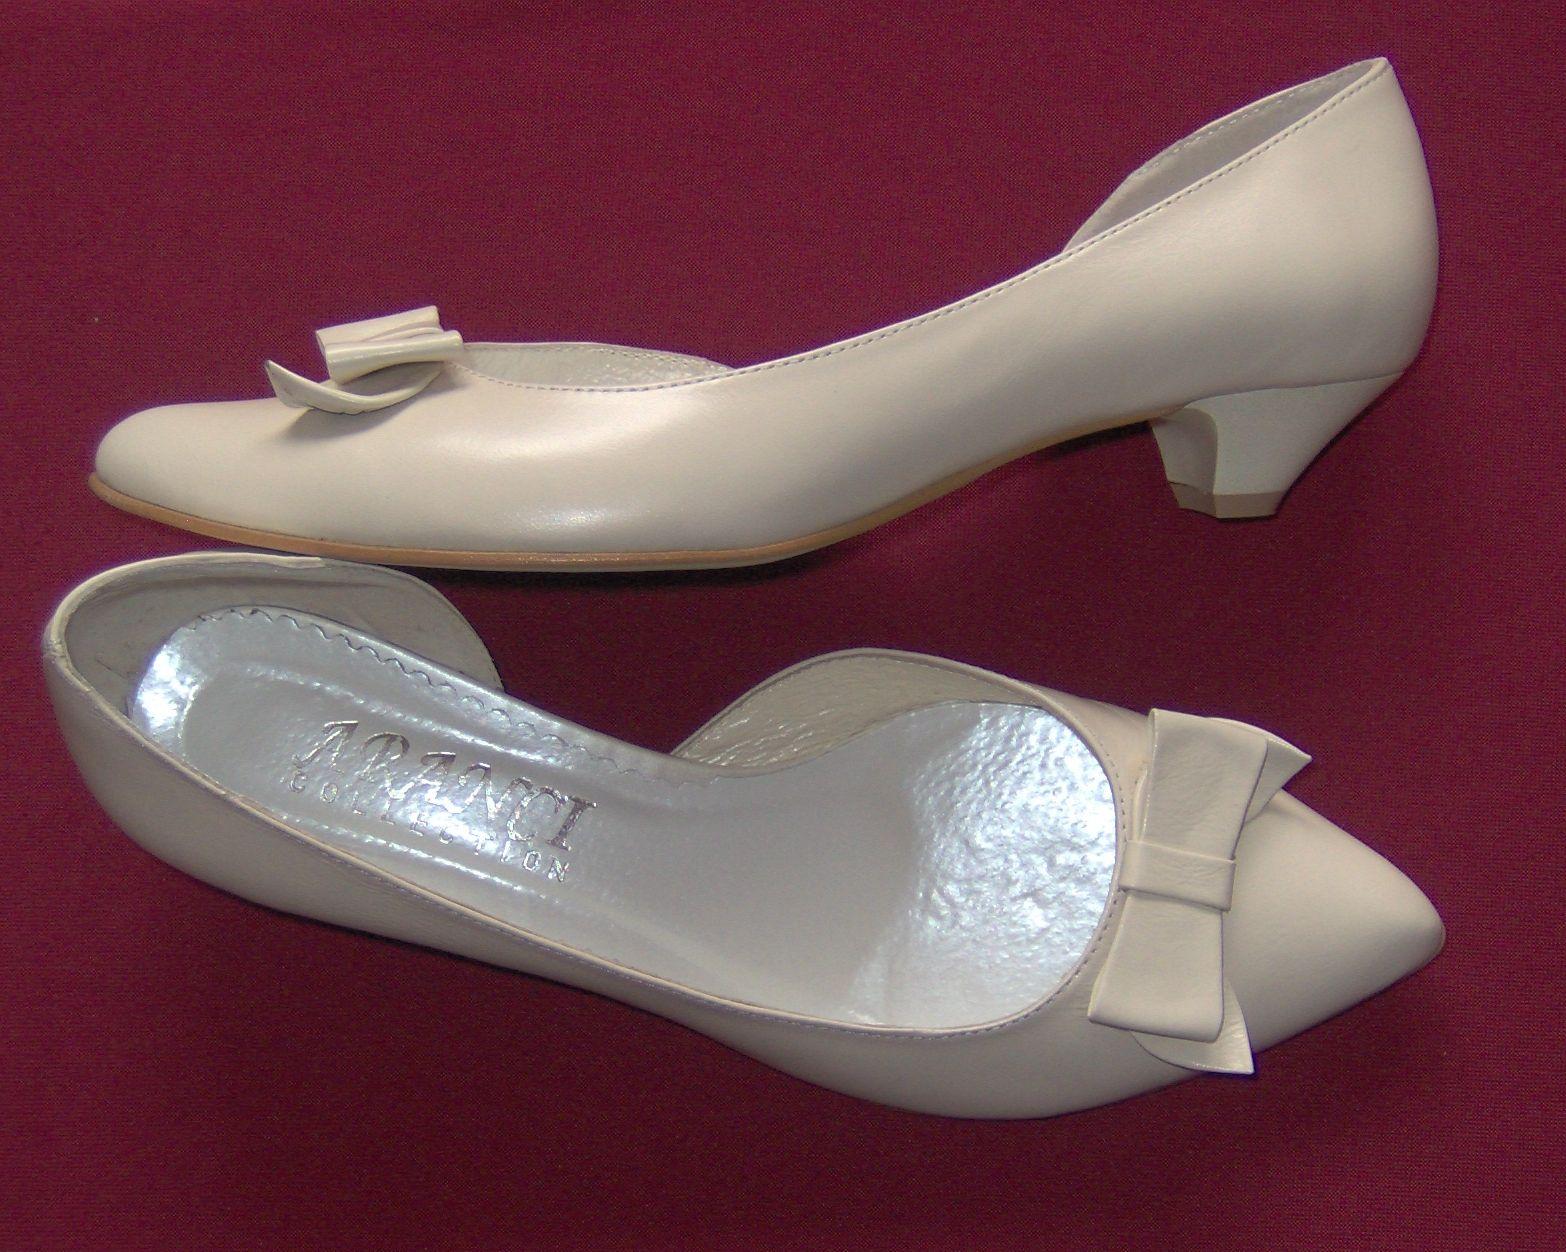 Kup Taniej Buty Gotowe A 119 Skora Naturalna Jasne Ecru Rozmiar 41 Character Shoes Dance Shoes Shoes